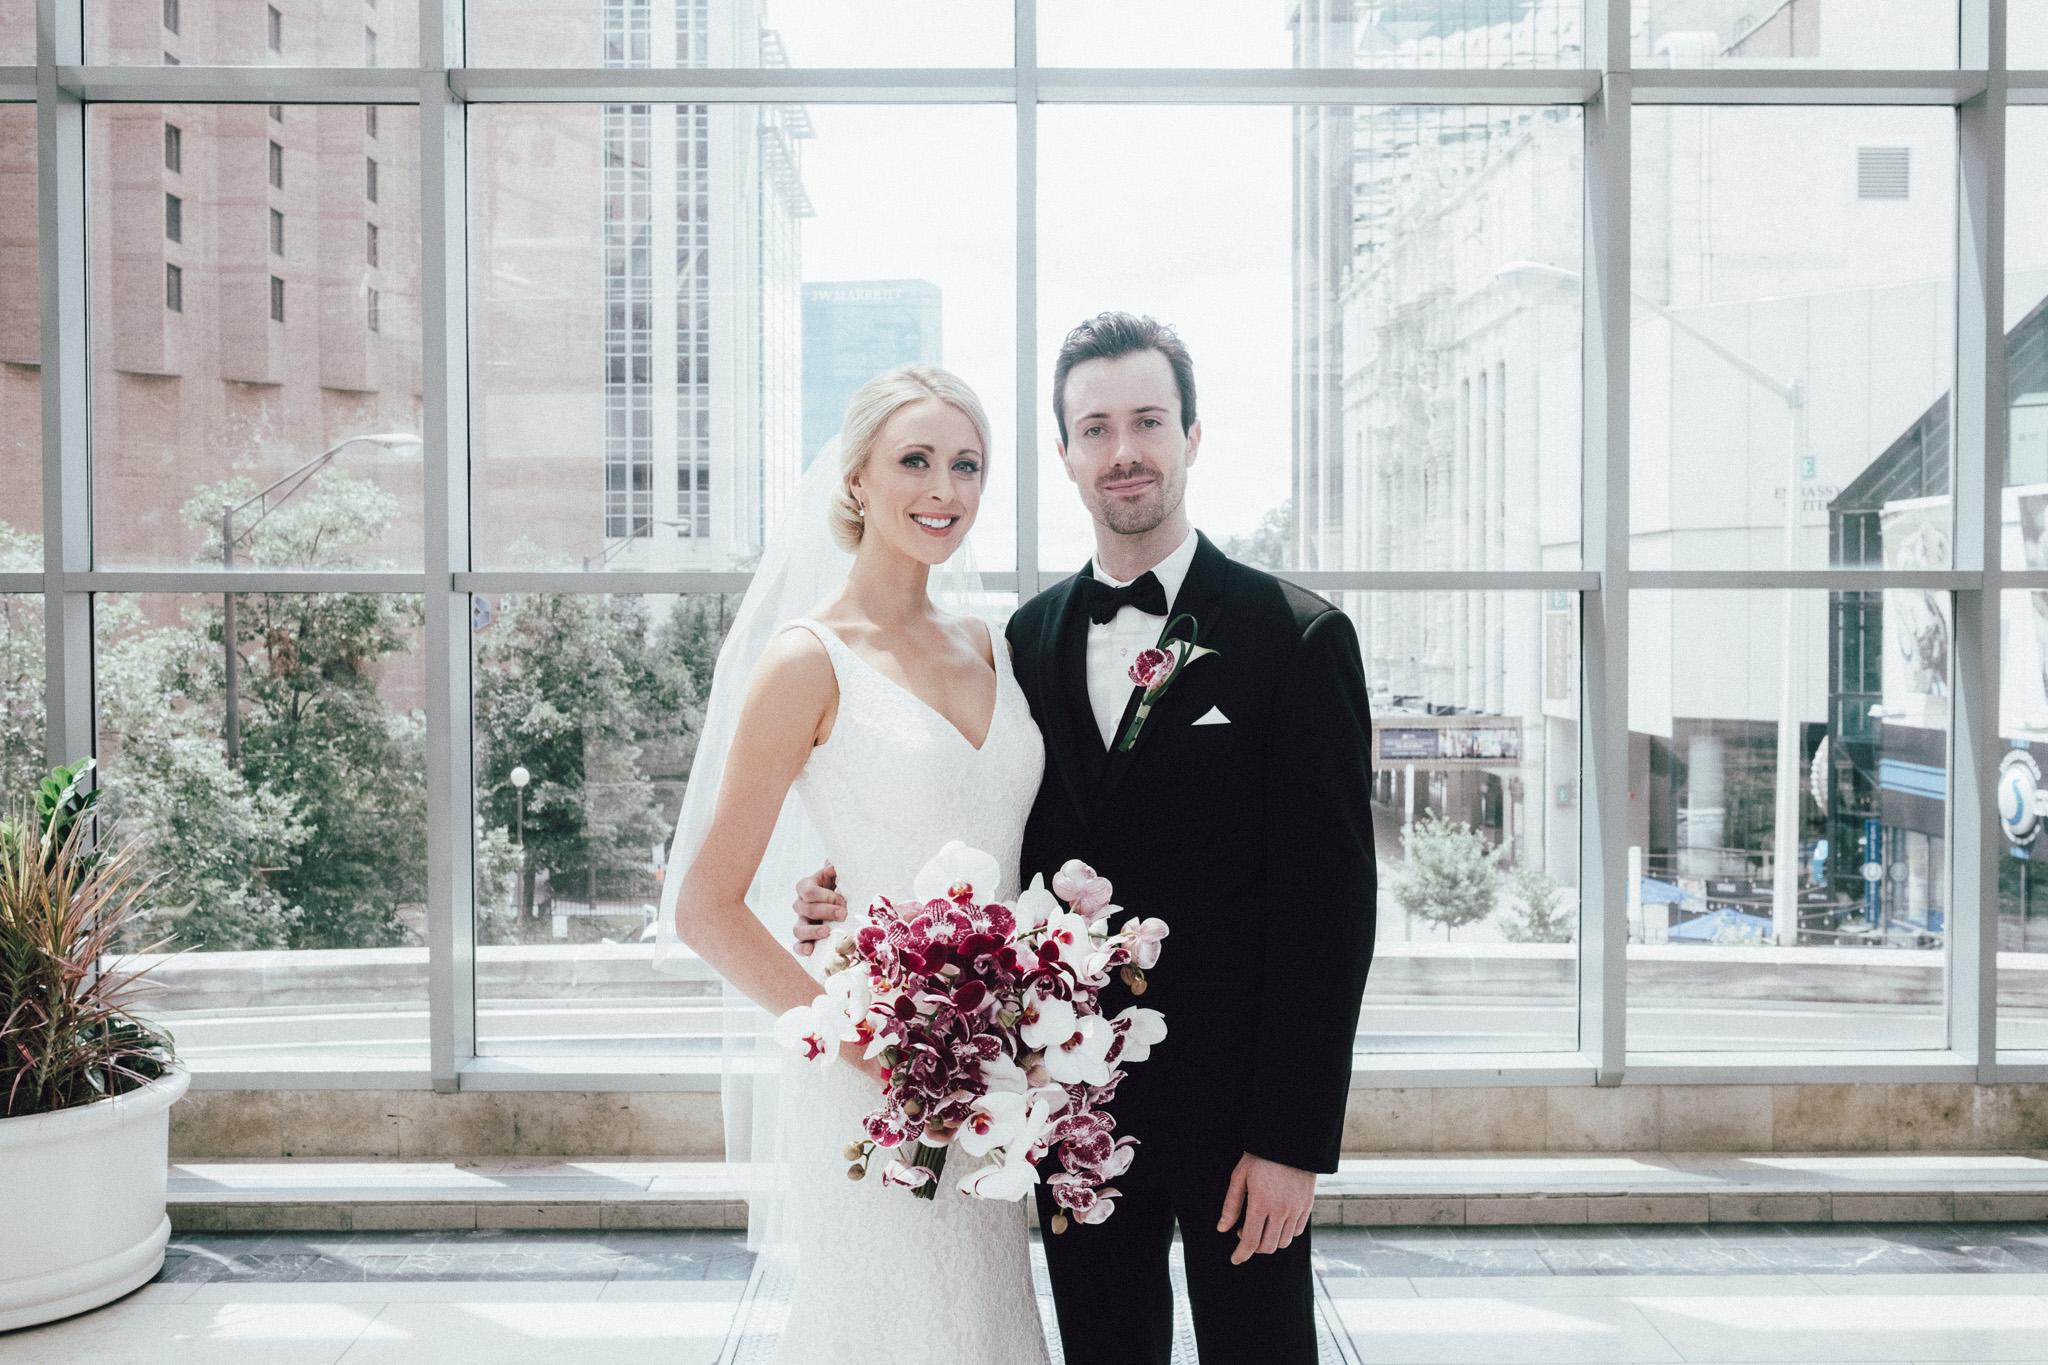 Brooke-Kyle-Indianapolis-Wedding-Blog-66.jpg